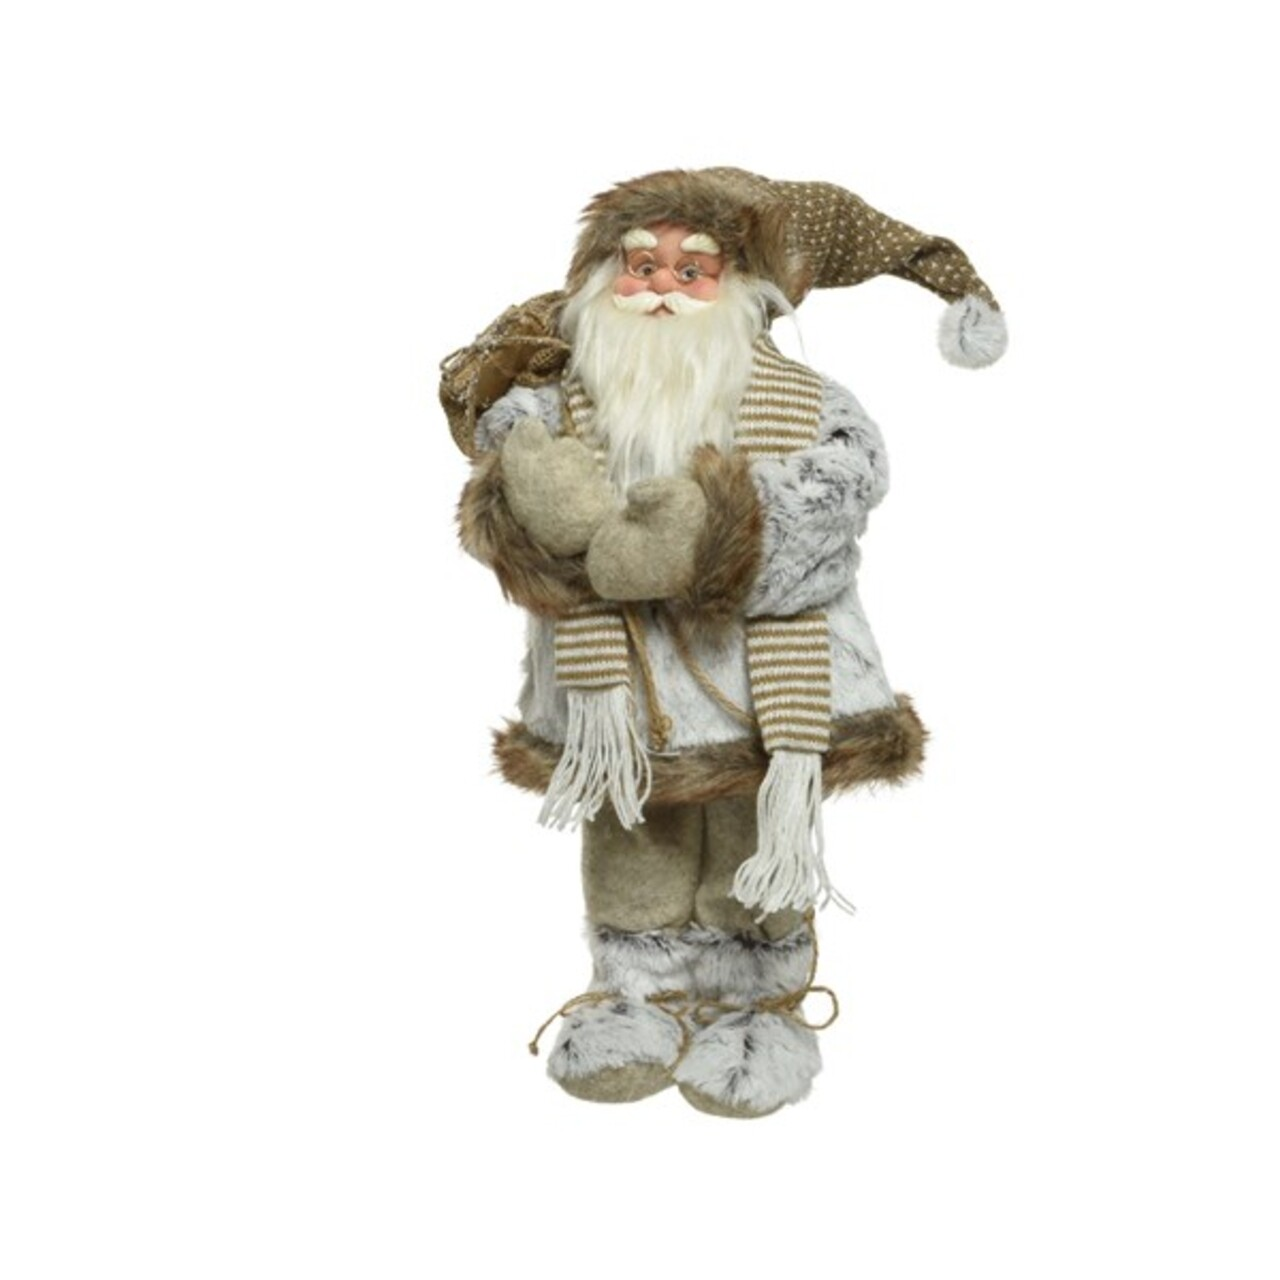 Decoratiune Santa w scarf, Decoris, H30 cm, poliester, maro